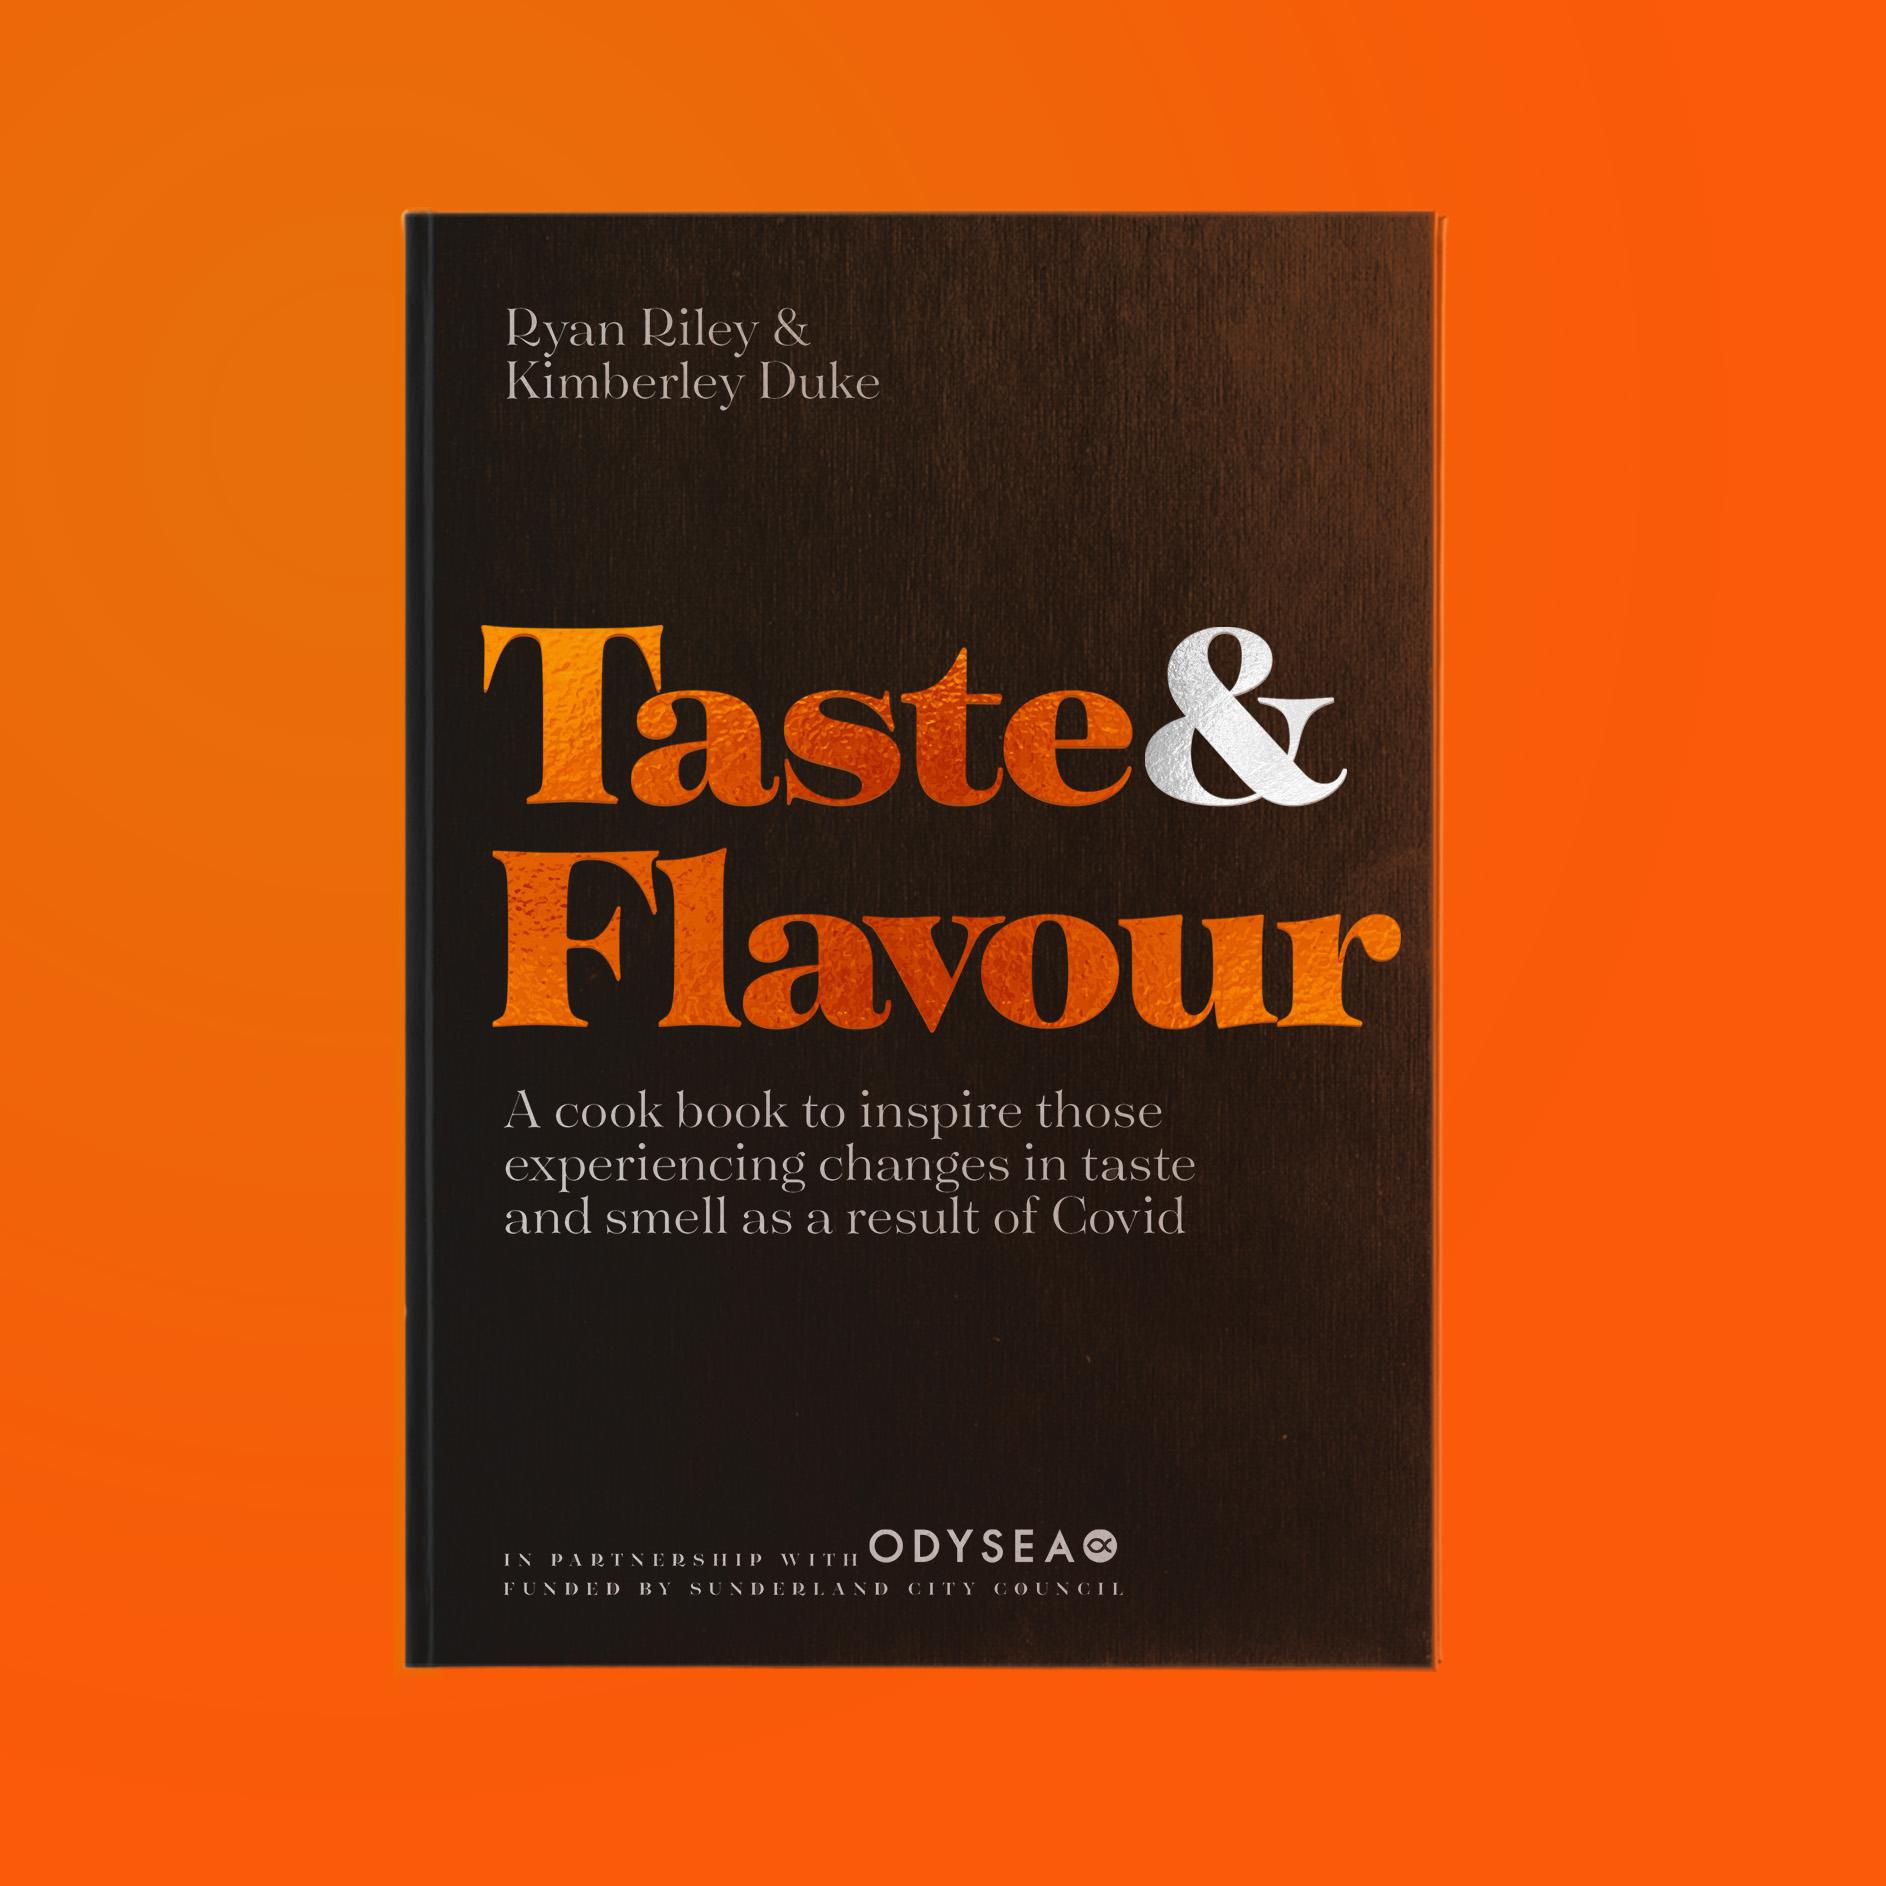 TASTE AND FLAVOUR COOKBOOK